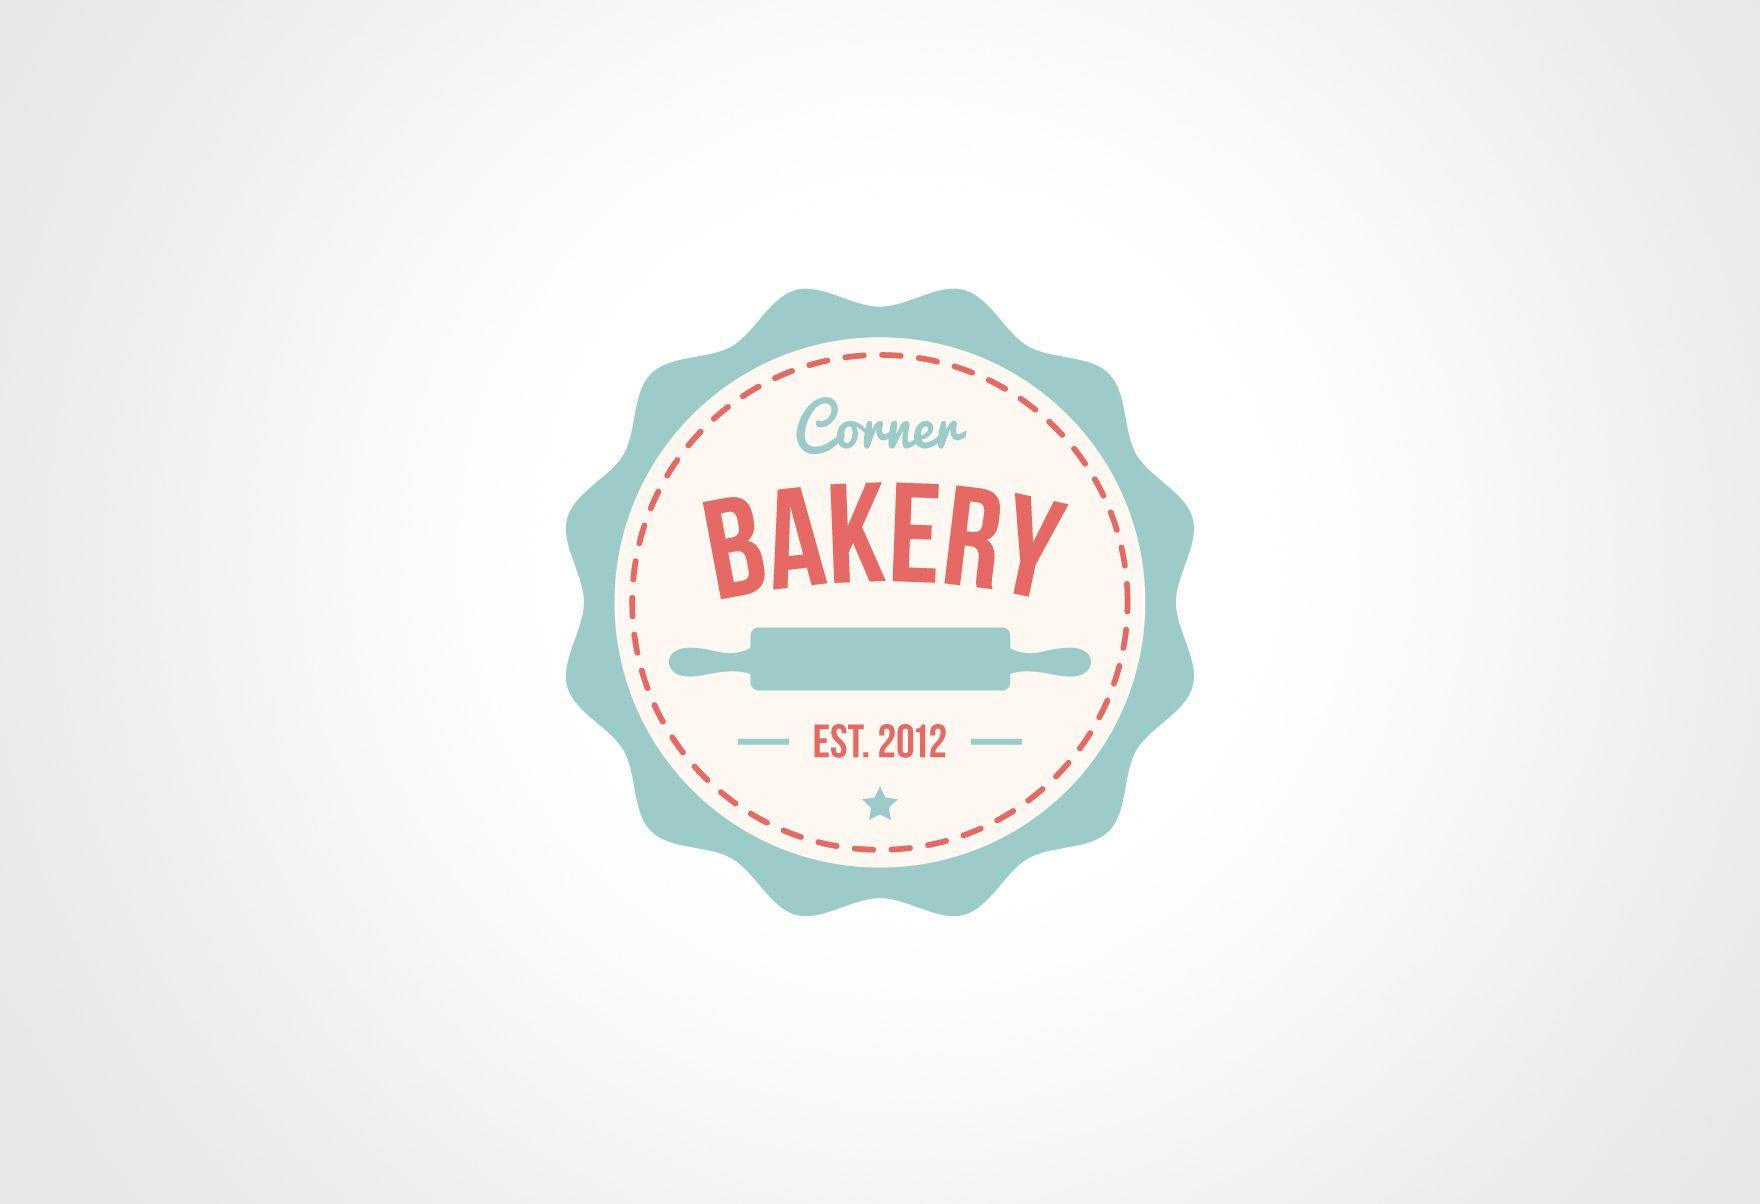 Speak your mind cancel reply logo pinterest bakery logo premade logo design bakery retro vintage by clementinecreative pronofoot35fo Choice Image